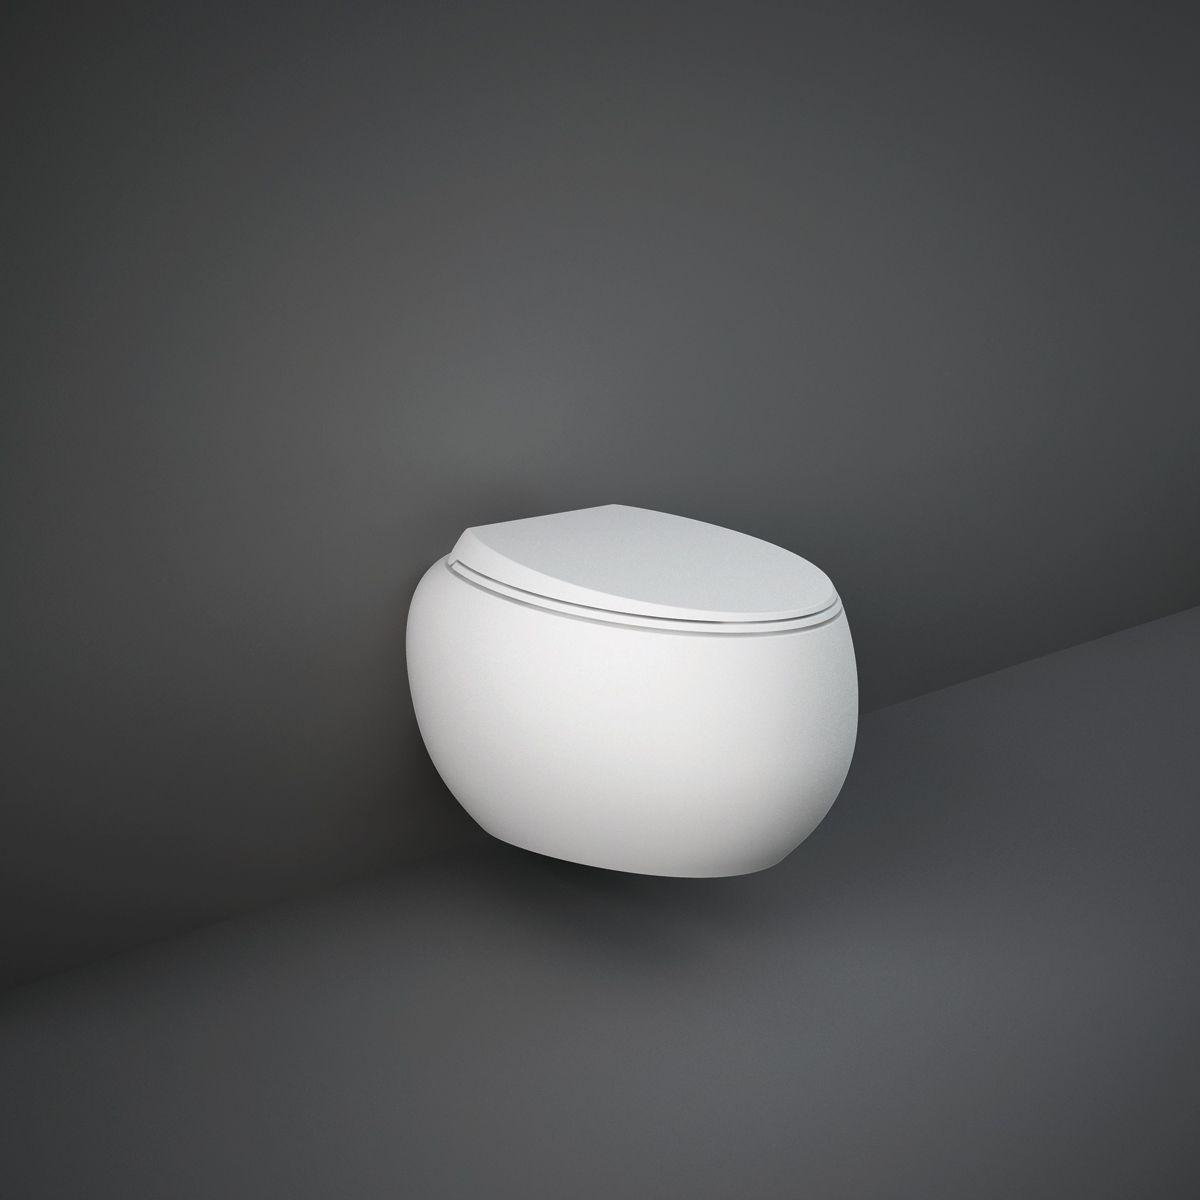 RAK Cloud Matt White Wall Hung Toilet with Soft Close Seat